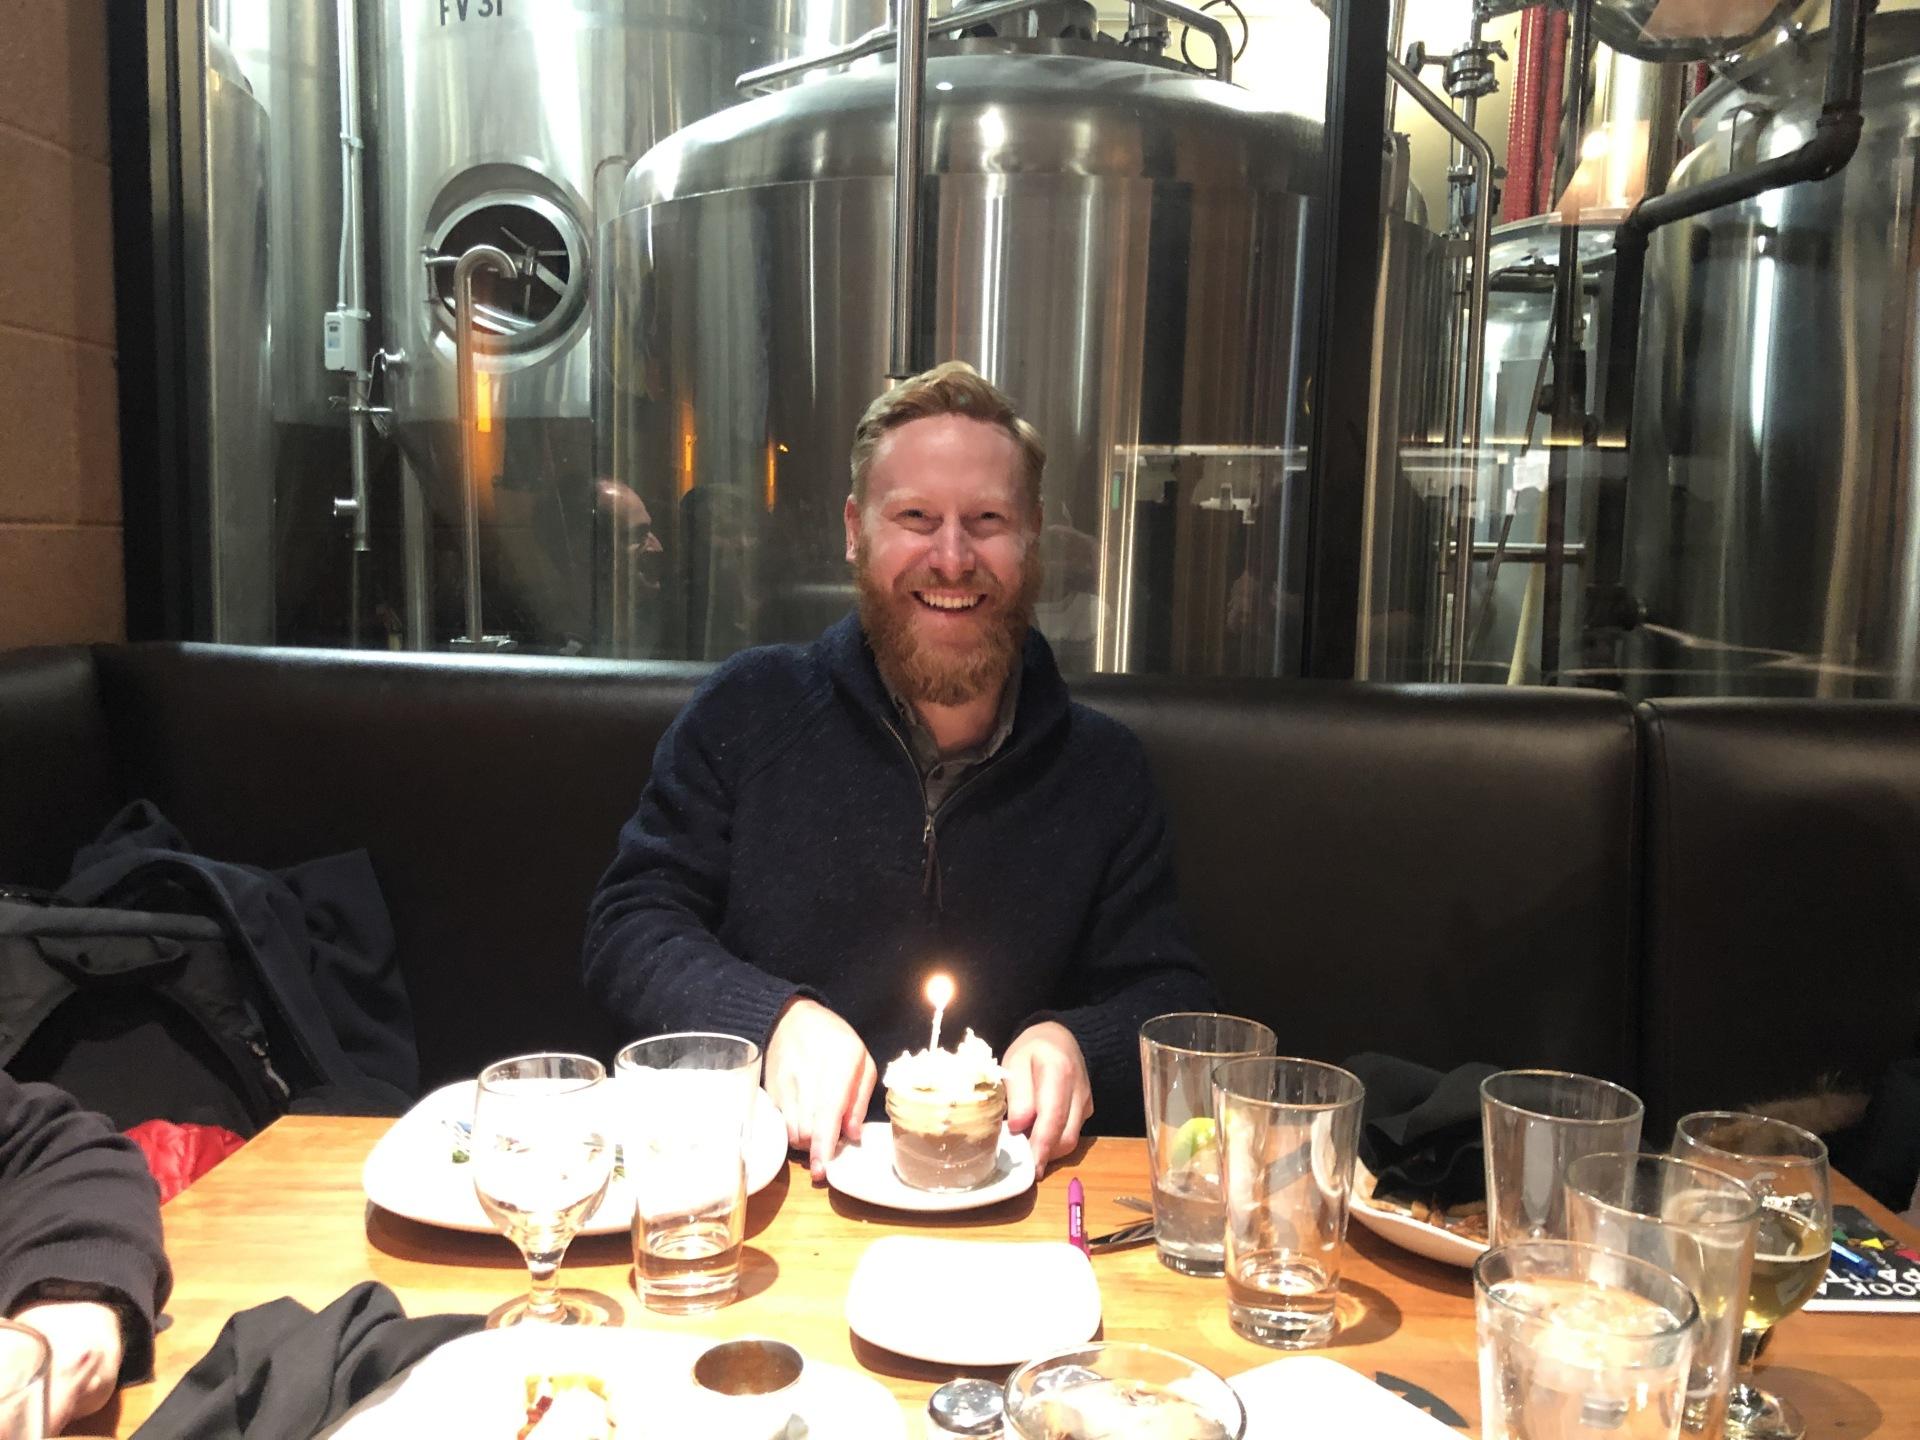 Happy Birthday Michael !!